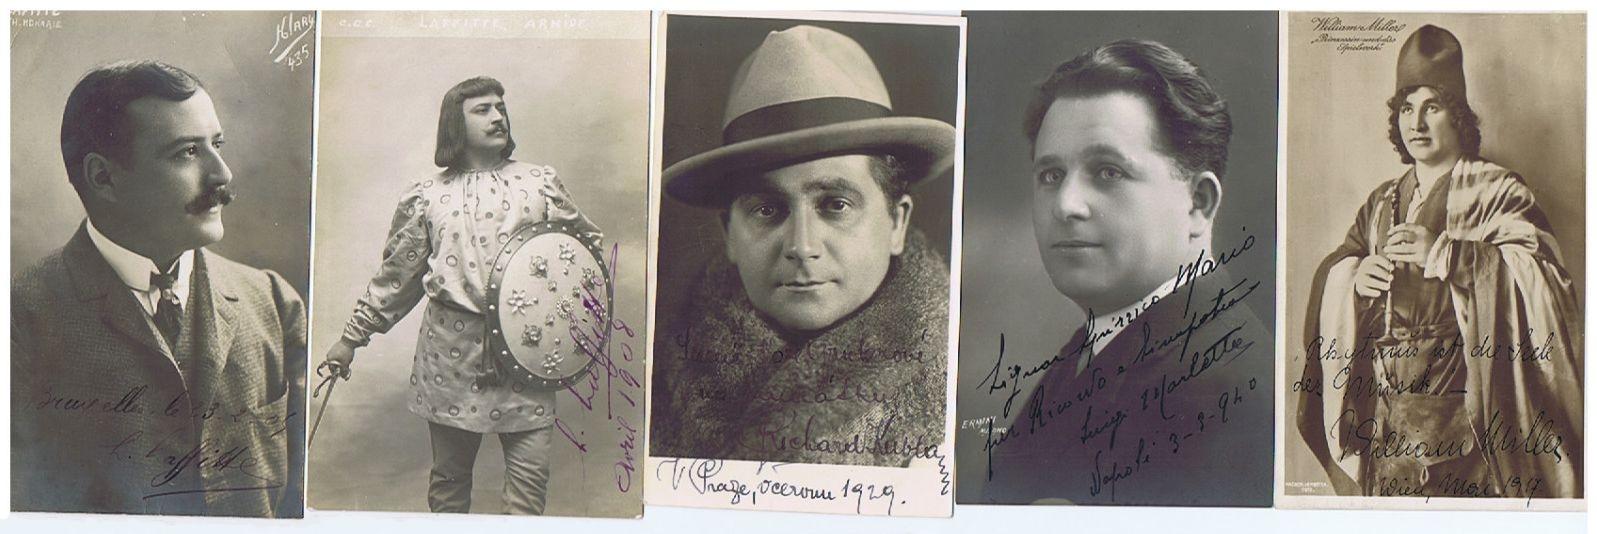 Forgotten Opera Singers